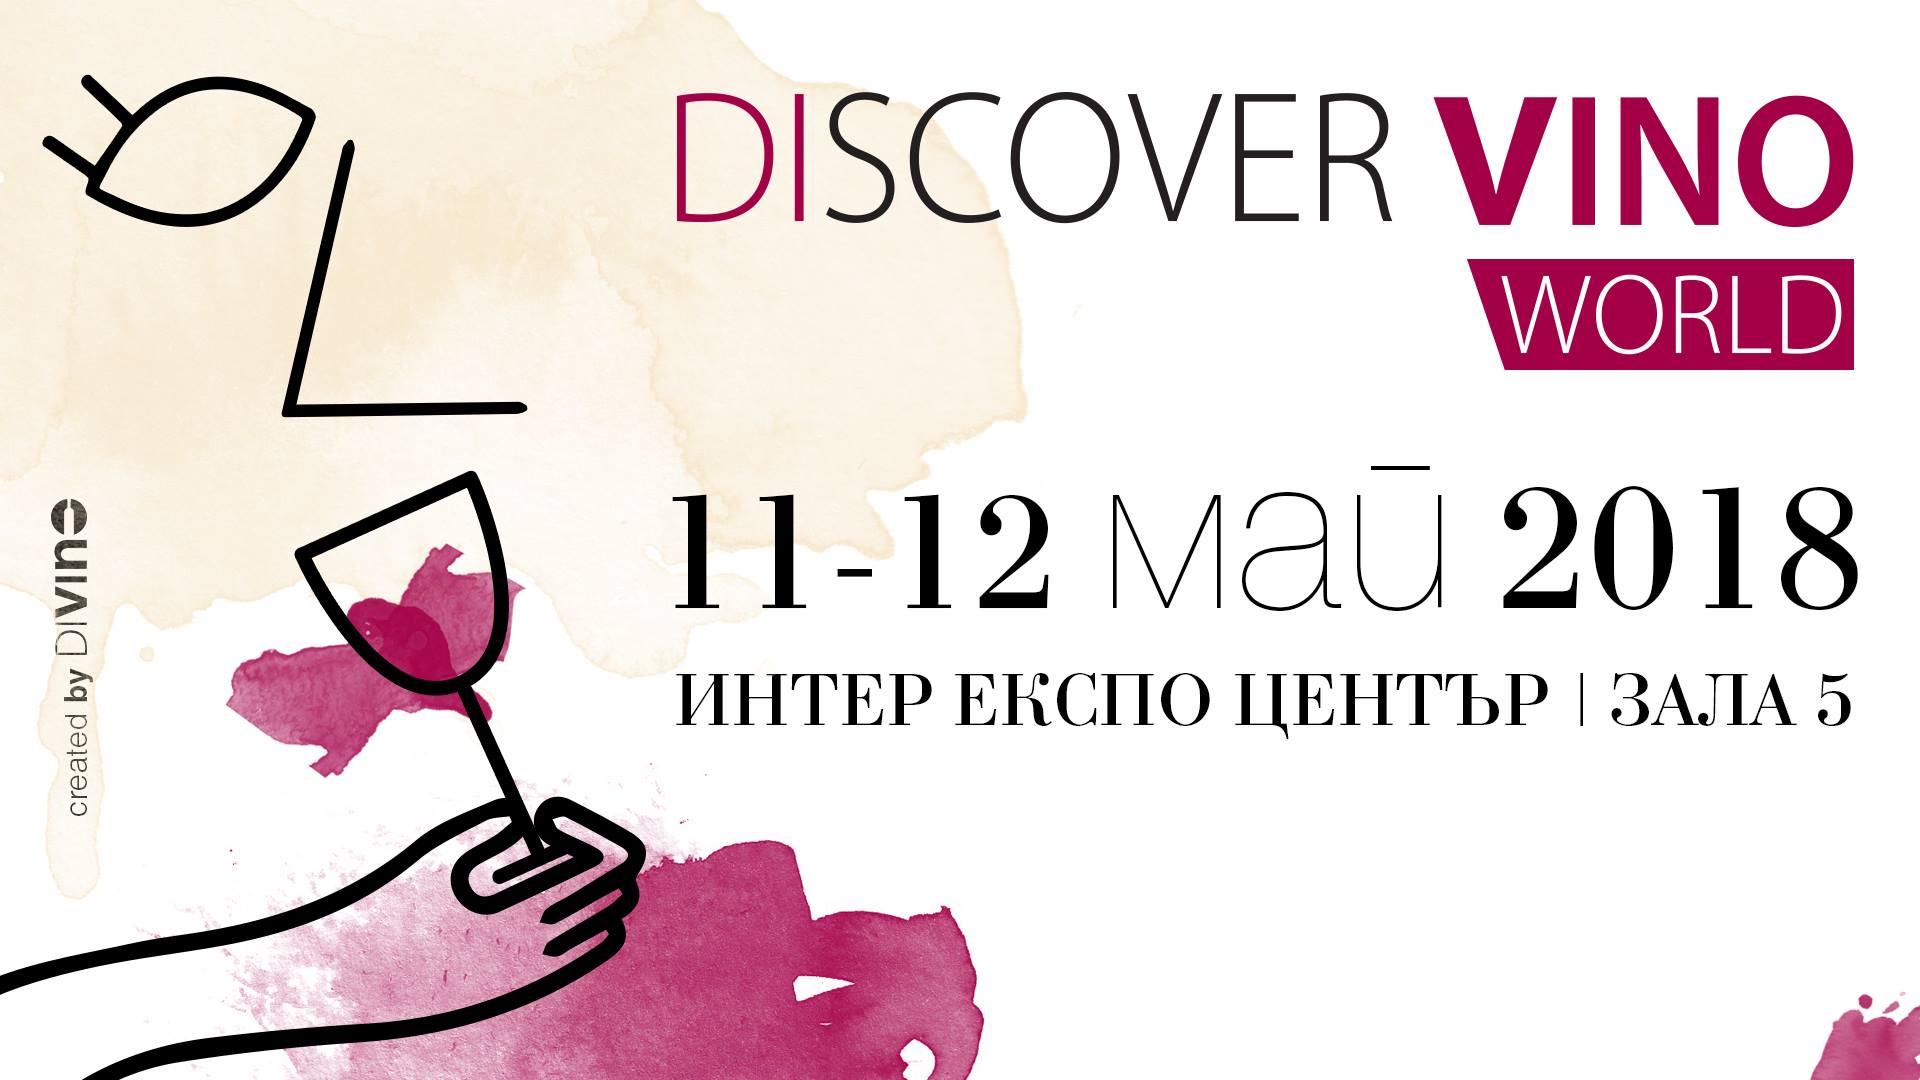 discover.vino-2018